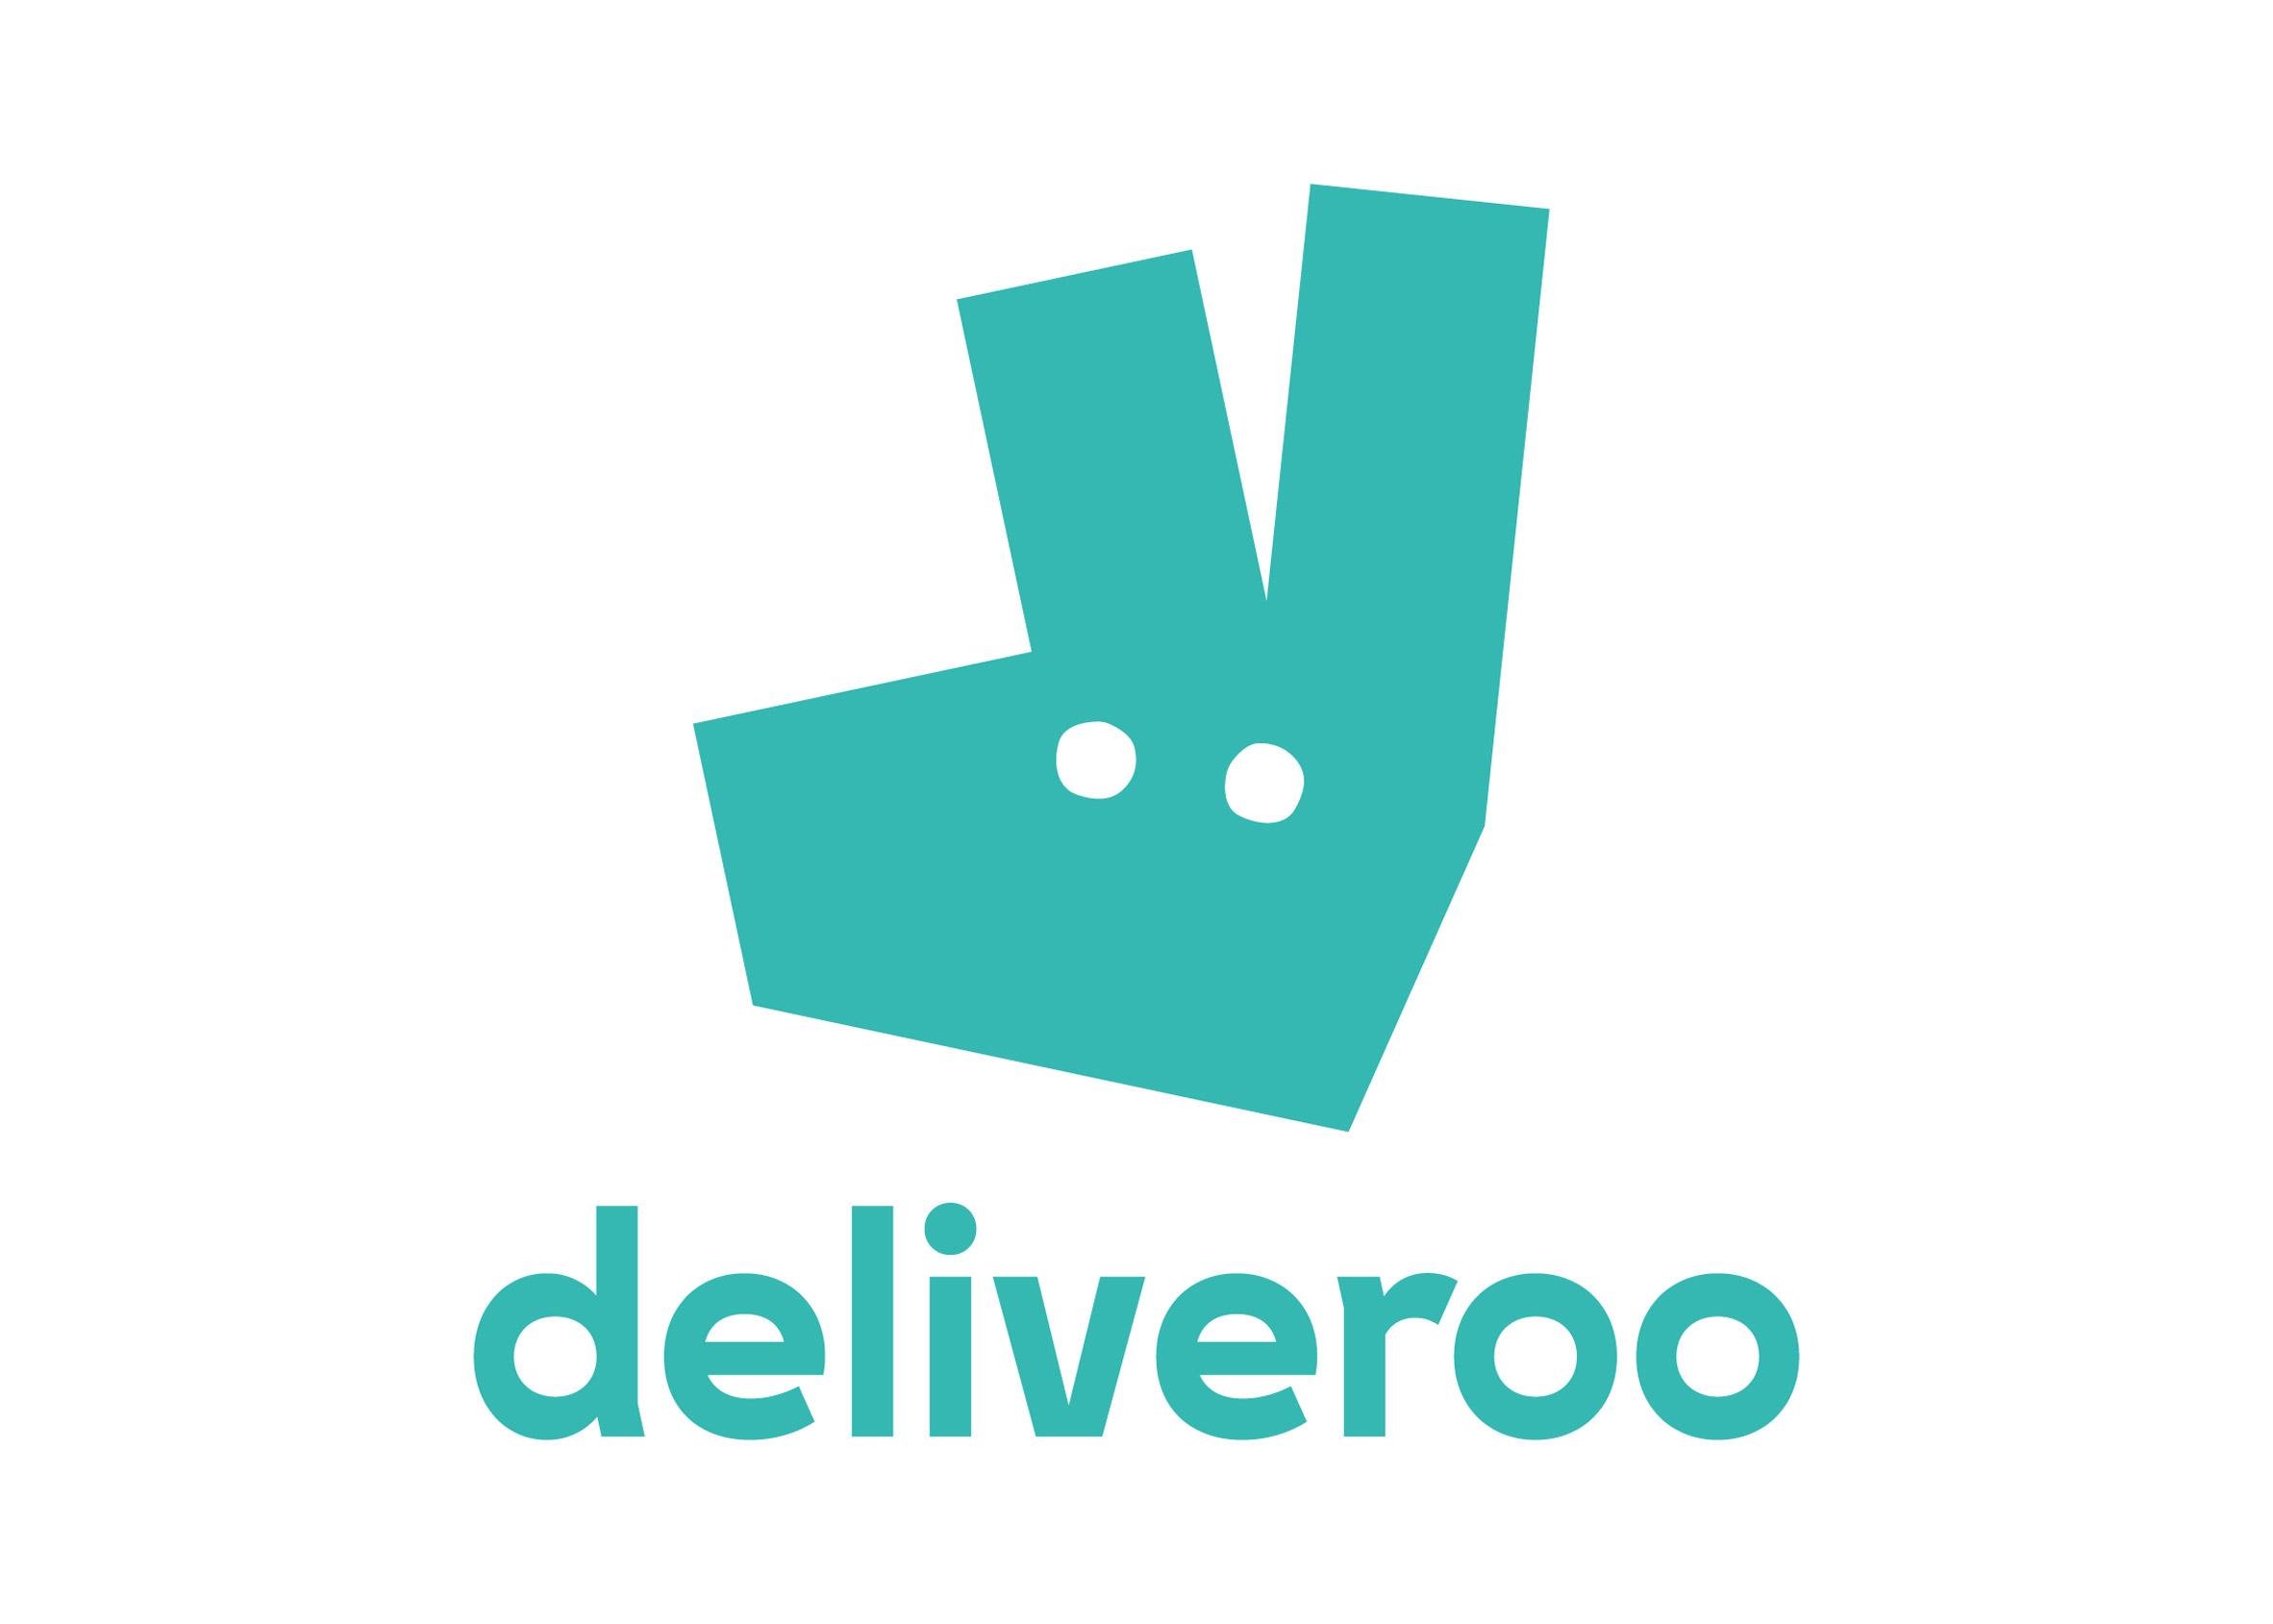 DesignStudio completes minimal rebrand for Deliveroo